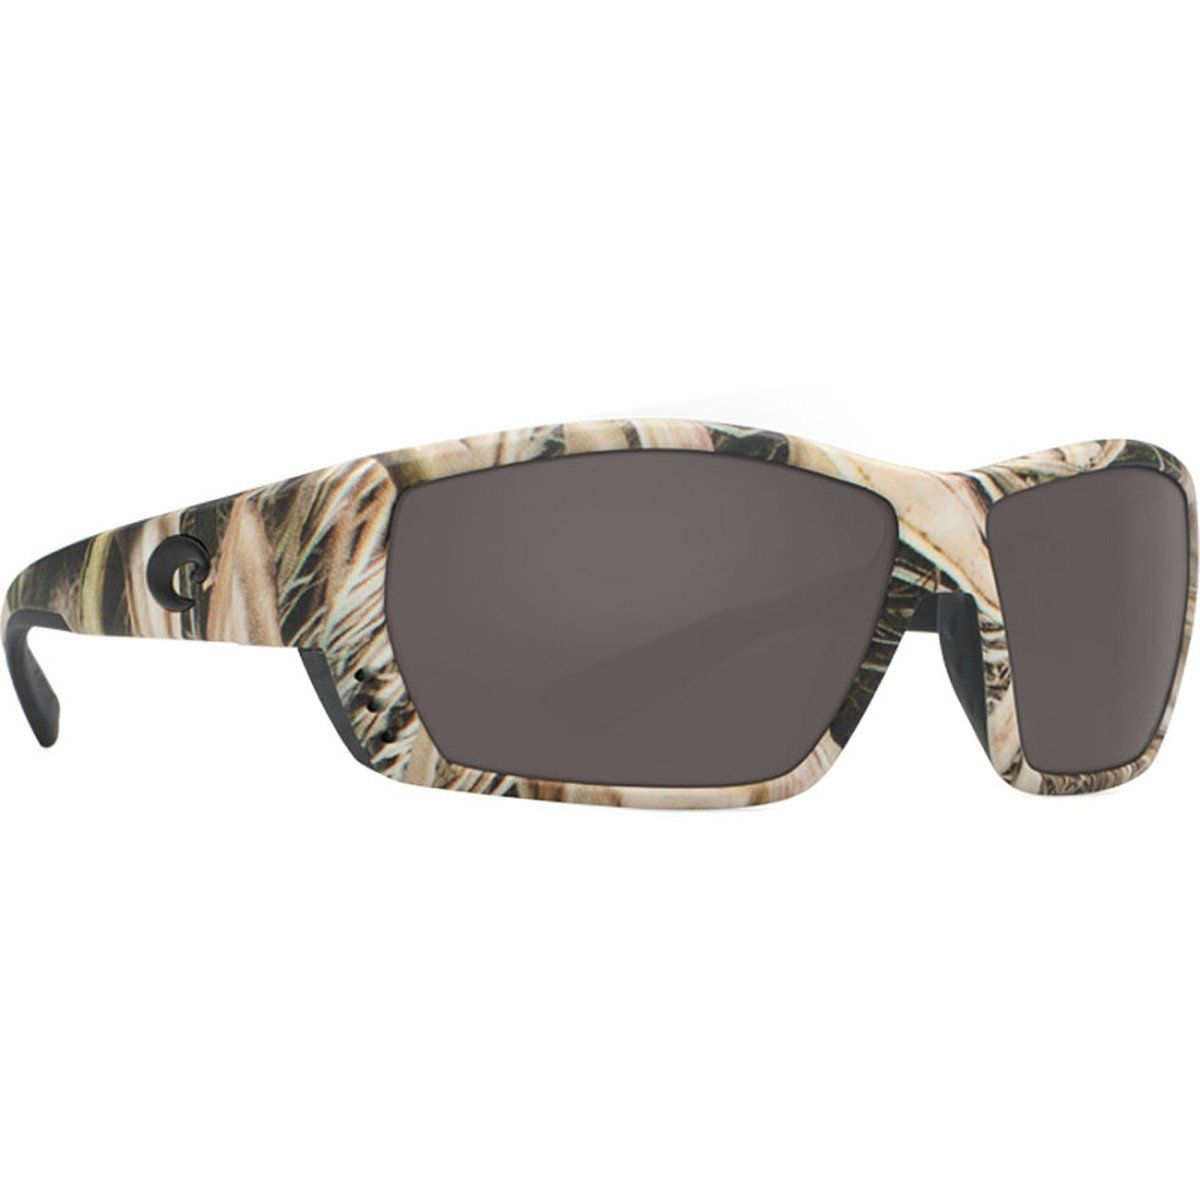 Costa Del Mar Tuna Alley Men's Polarized Sunglasses, Mossy Oak Shadow Grass Blades Camo/Gray Glass - W580